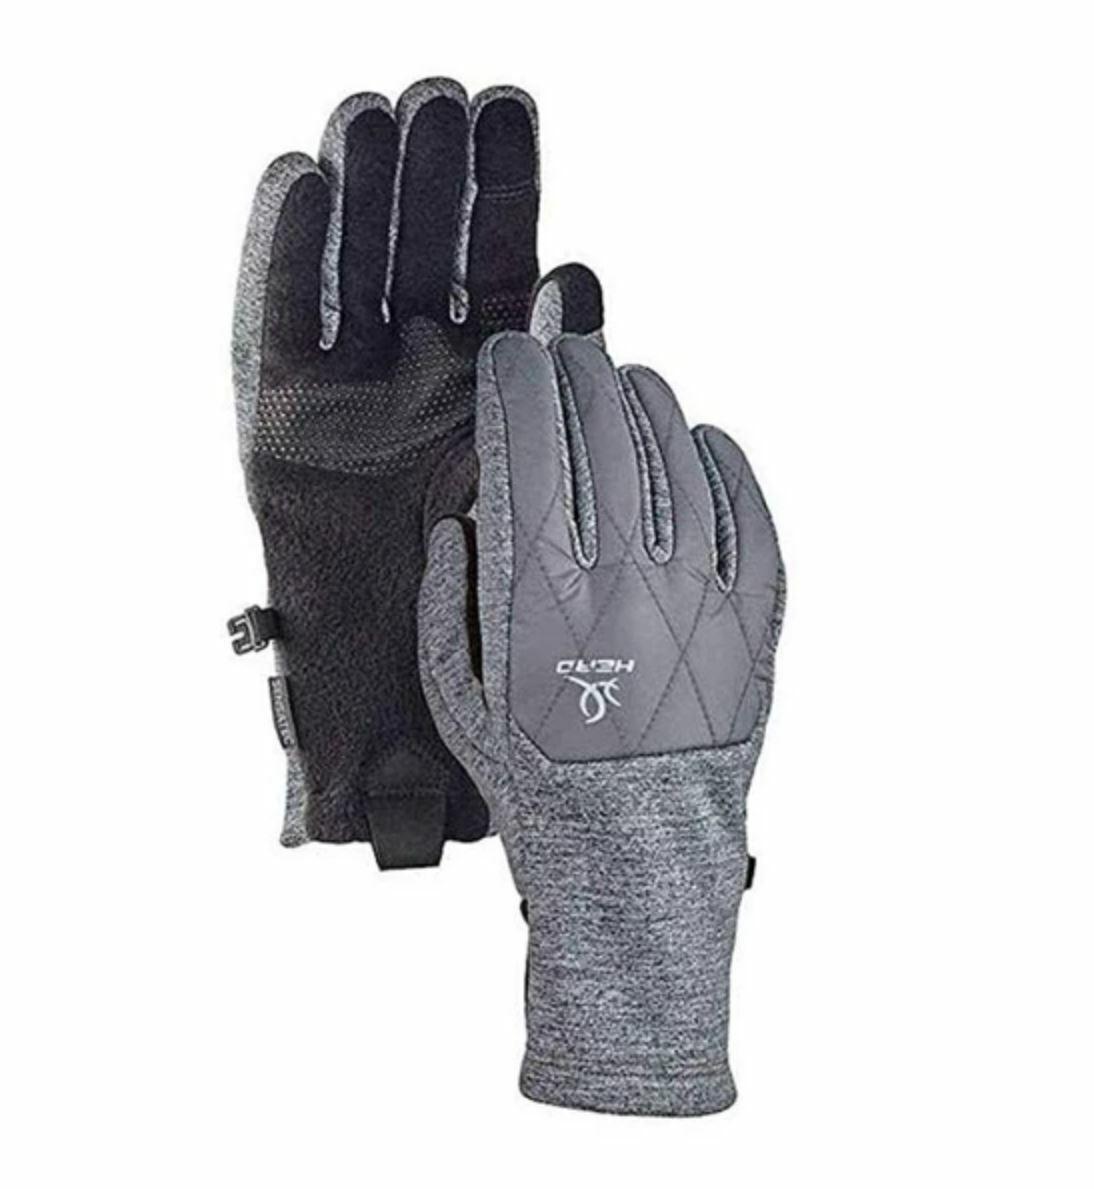 NWT HEAD Women's Hybrid Glove Cold Weather Running Gloves Size S